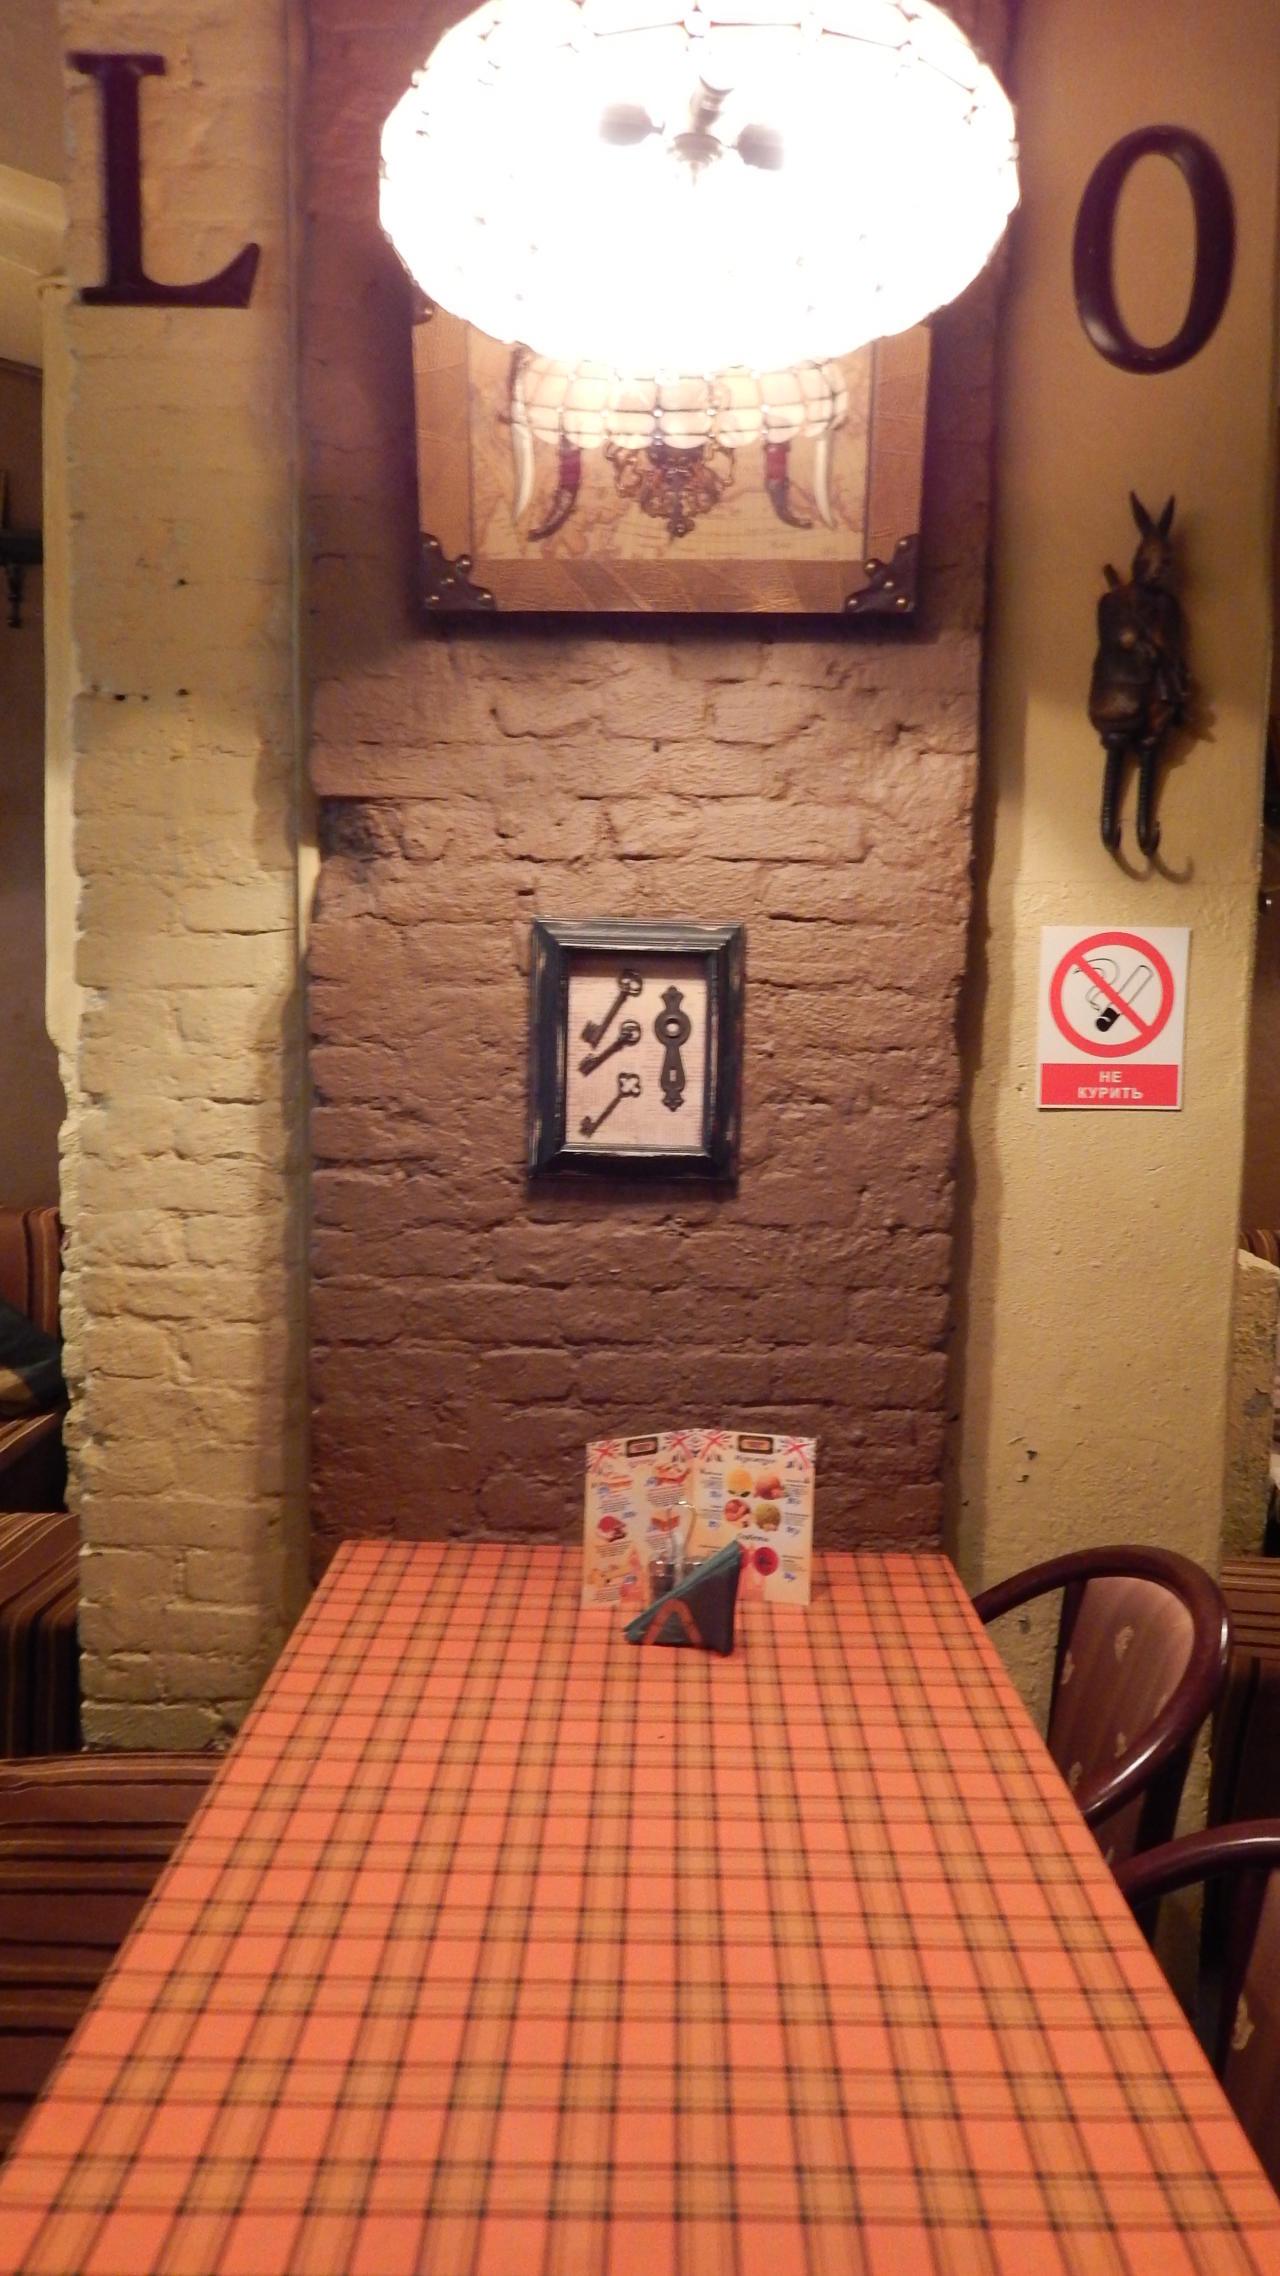 ���������� ������ �������� ������ ����� �� ���������� (London Grill) ���� 6